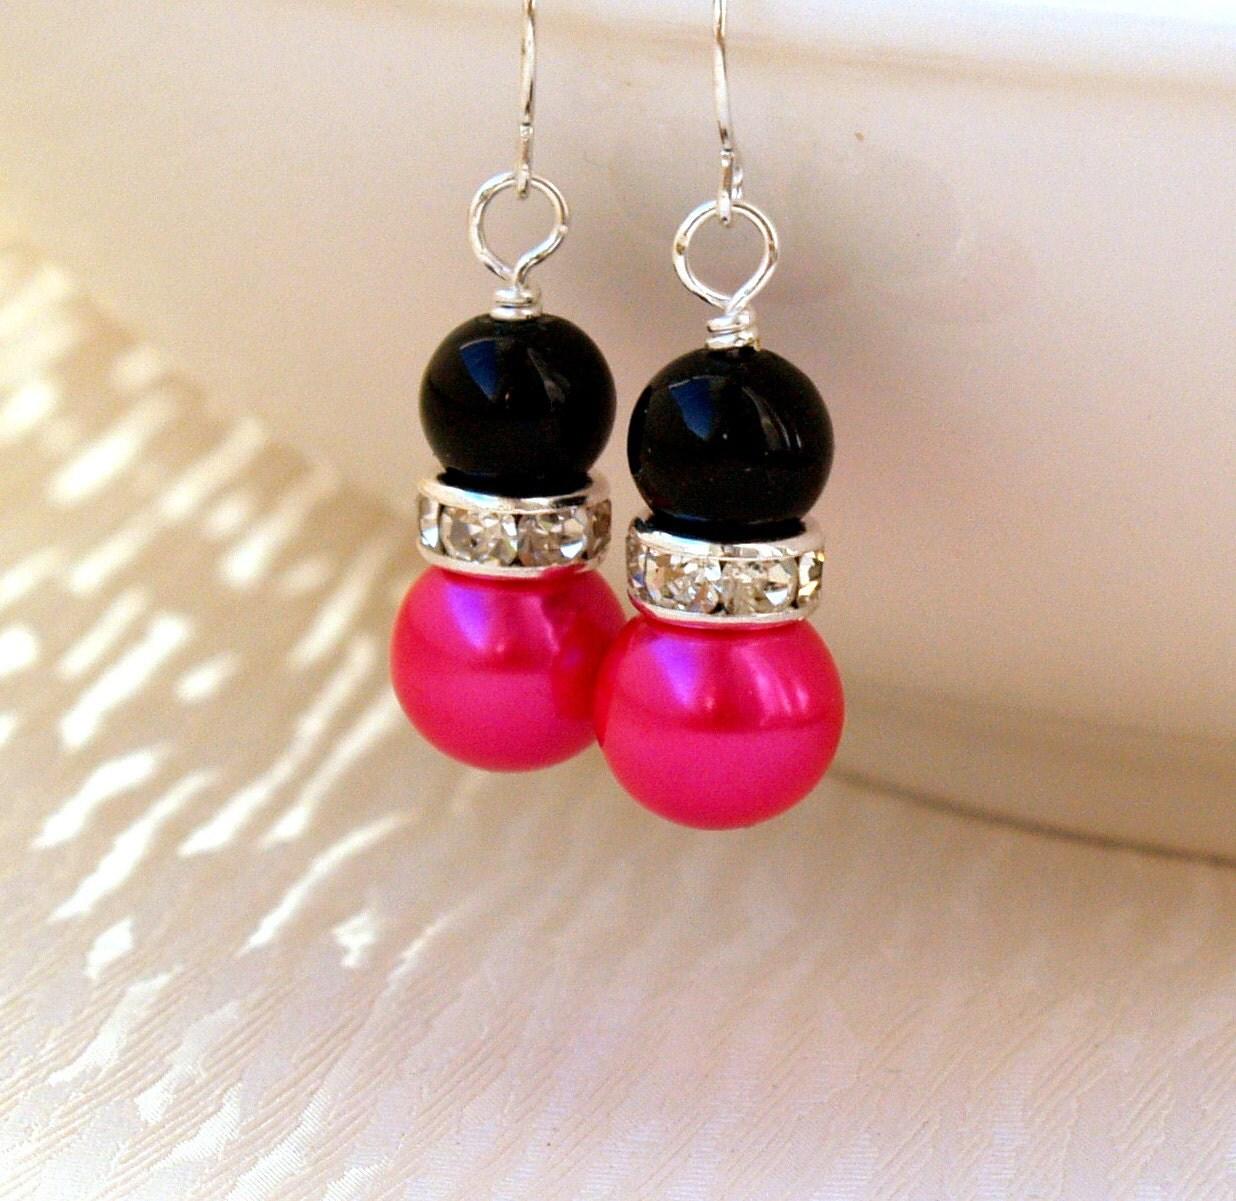 Black hot pink bridesmaid jewelry earrings hot pink black for Red black and green jewelry